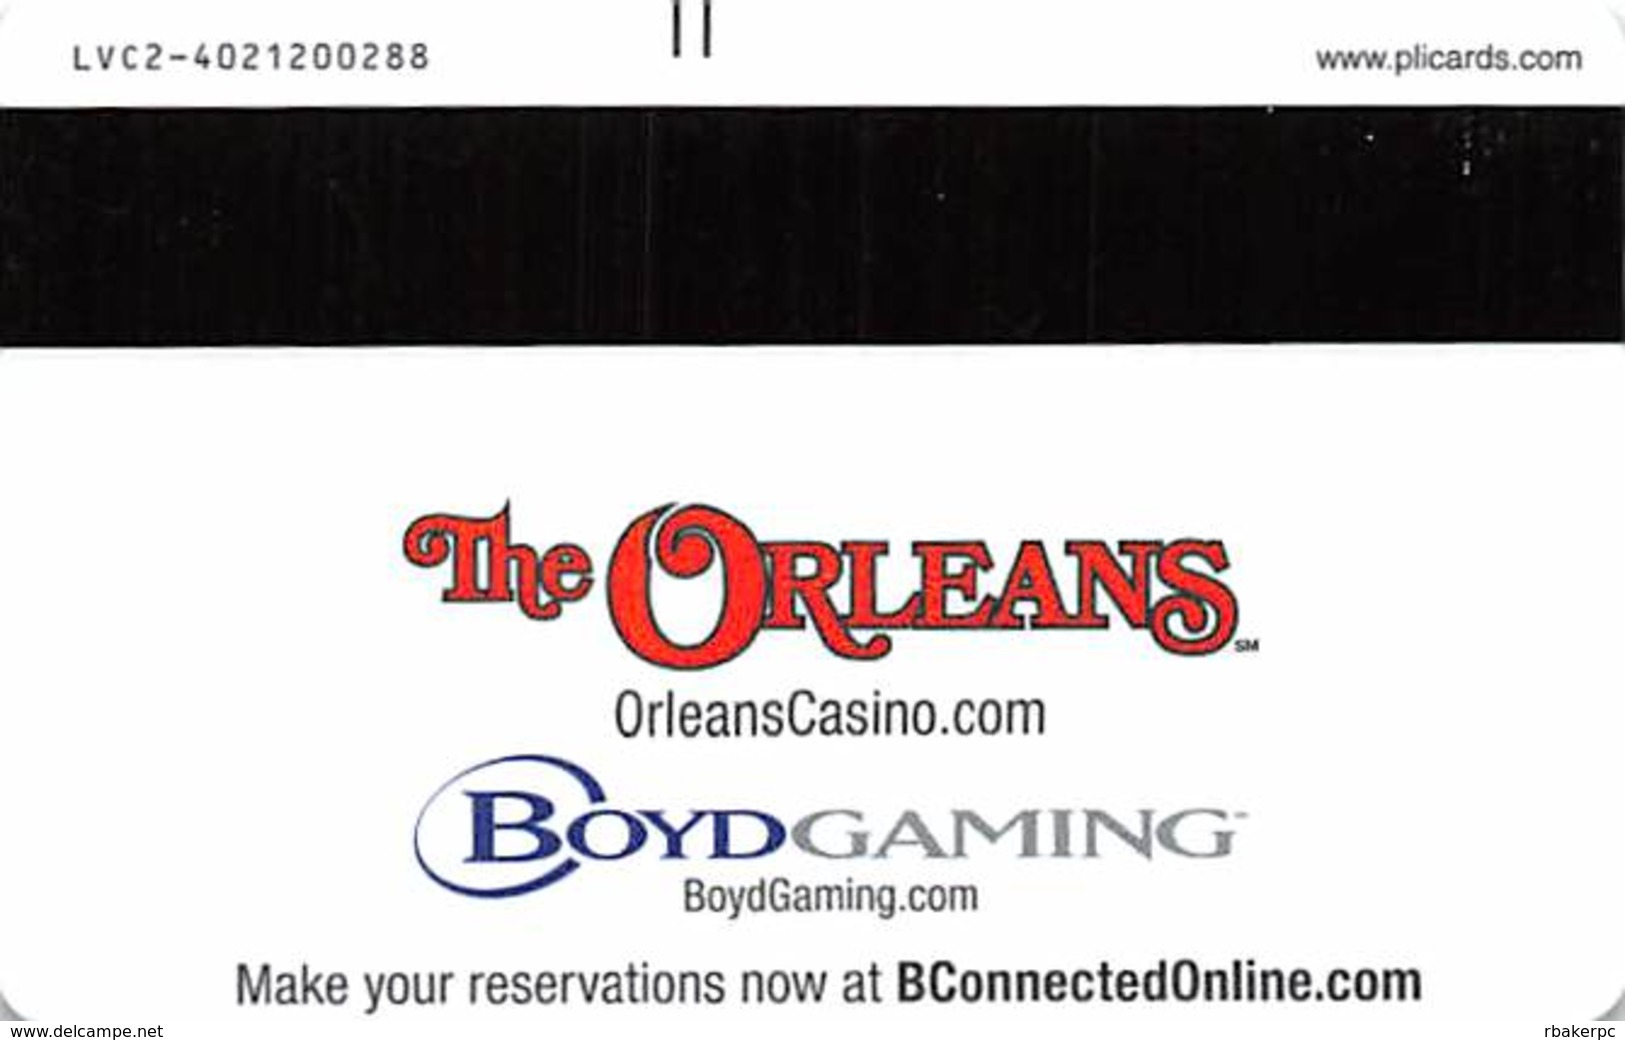 Orleans Casino Las Vegas, NV Hotel Room Key Card With LVC2-4021200288 - Hotel Keycards